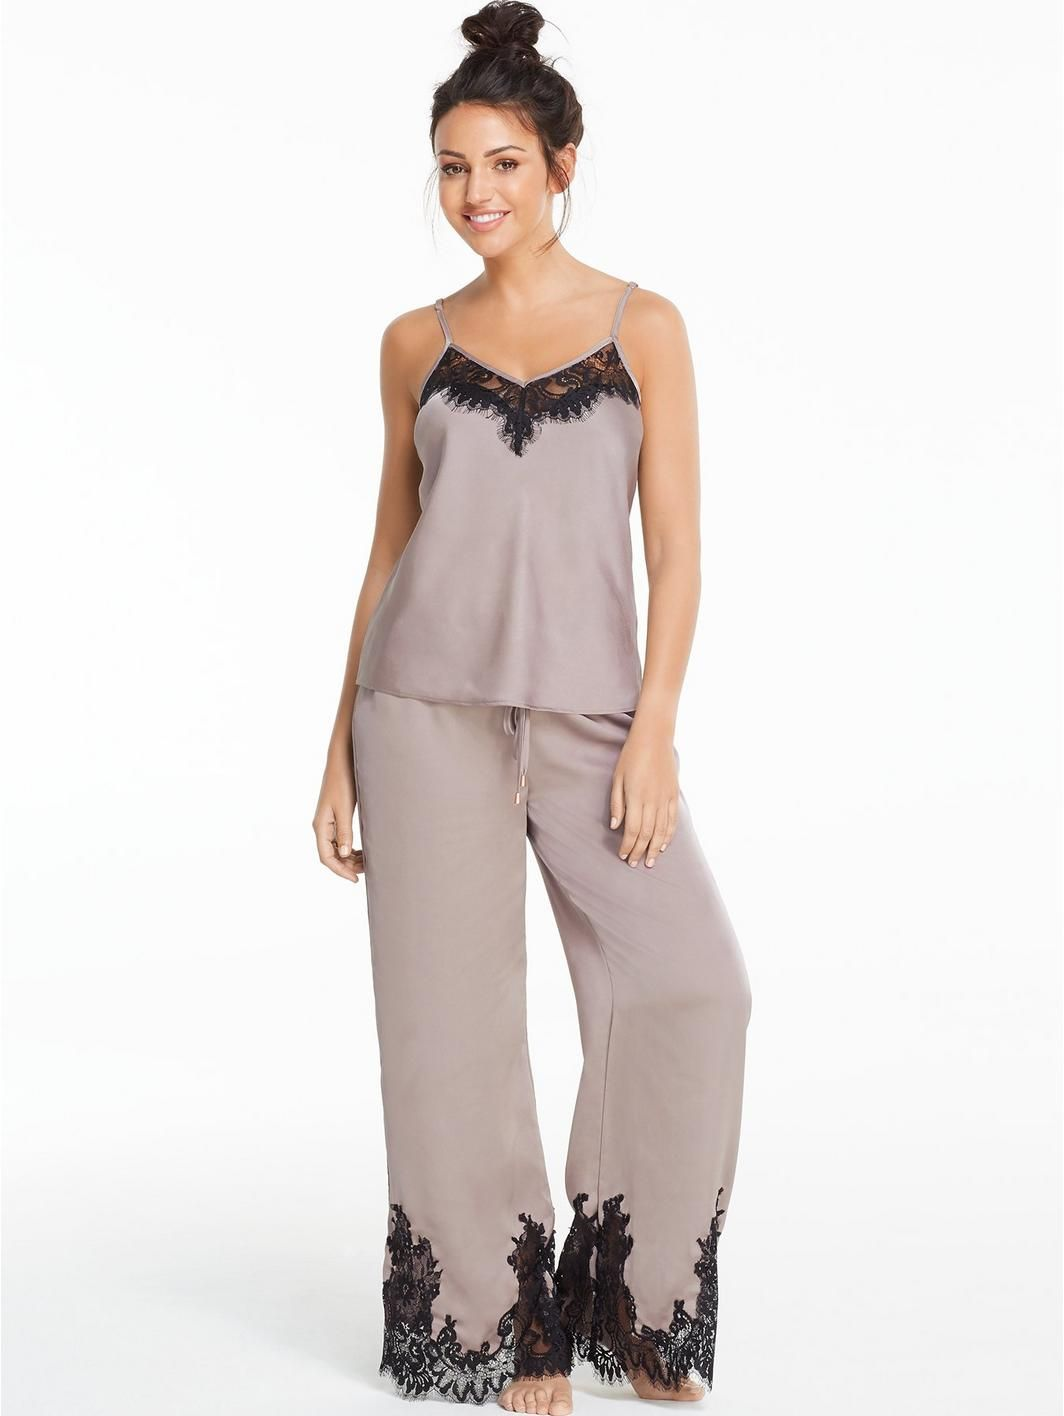 648578c785 Michelle Keegan Lace and Satin Pyjama Set